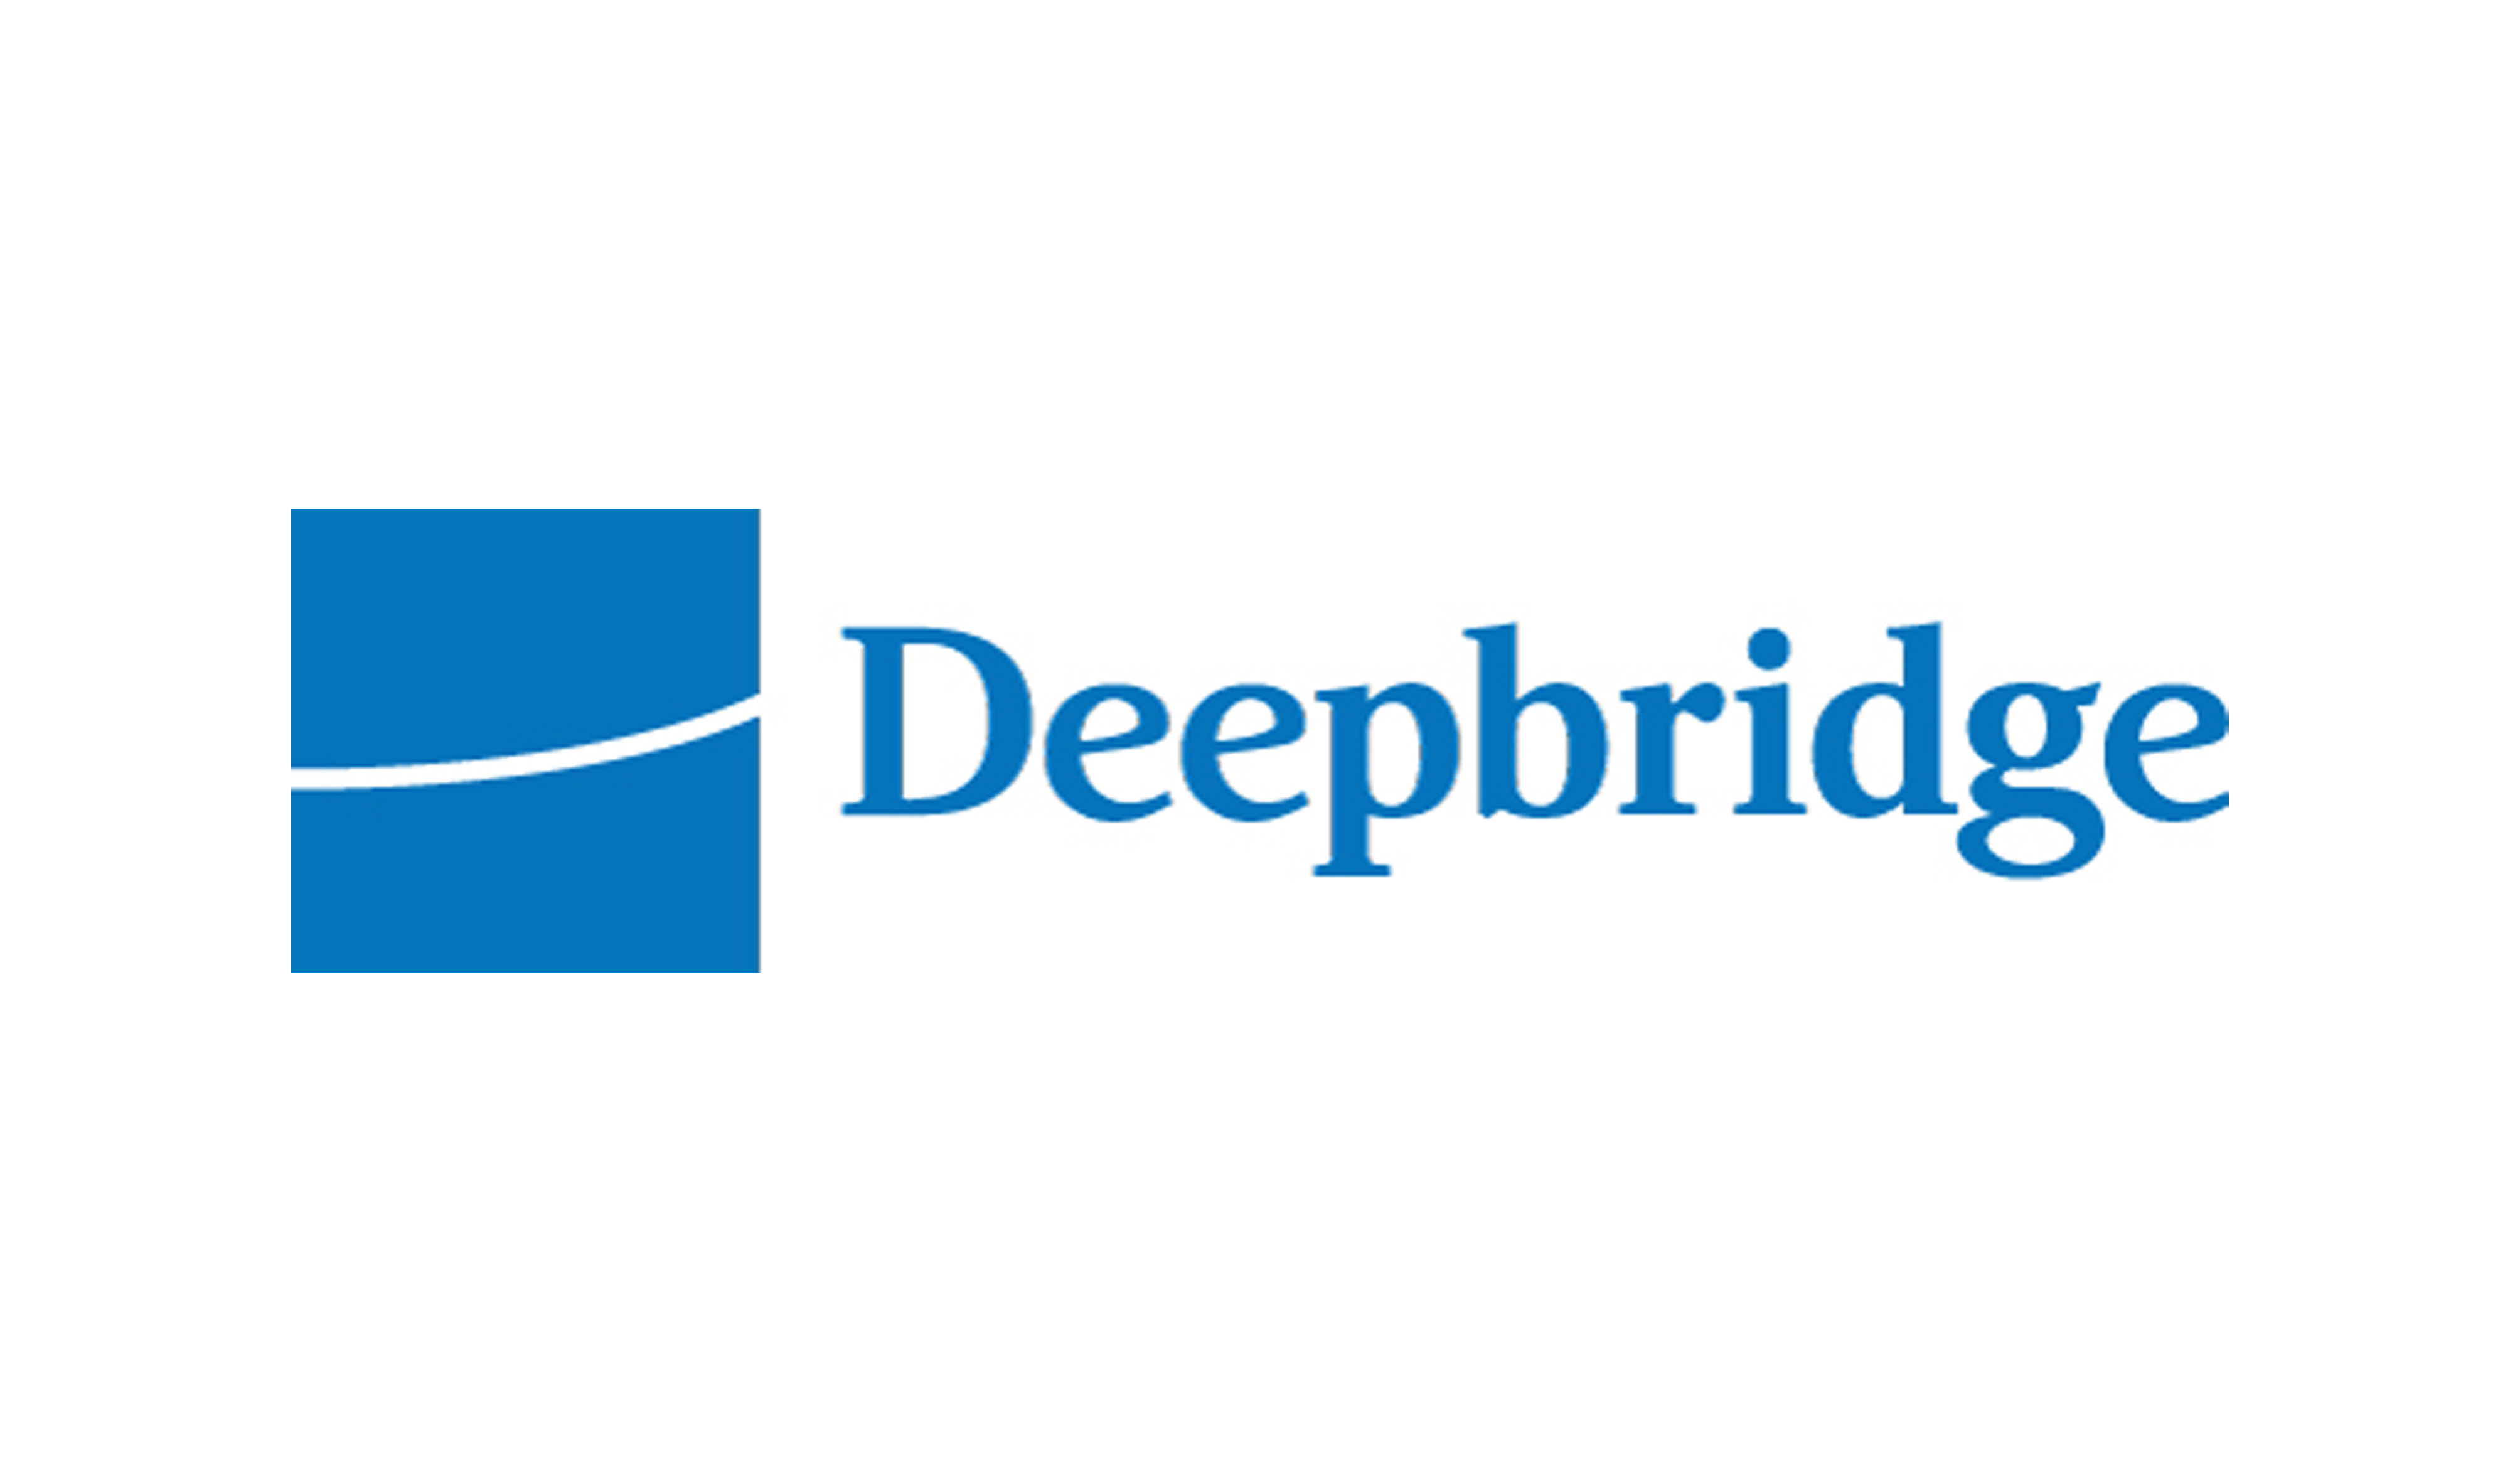 Deepbridge Achieves record EIS Fundraising Levels